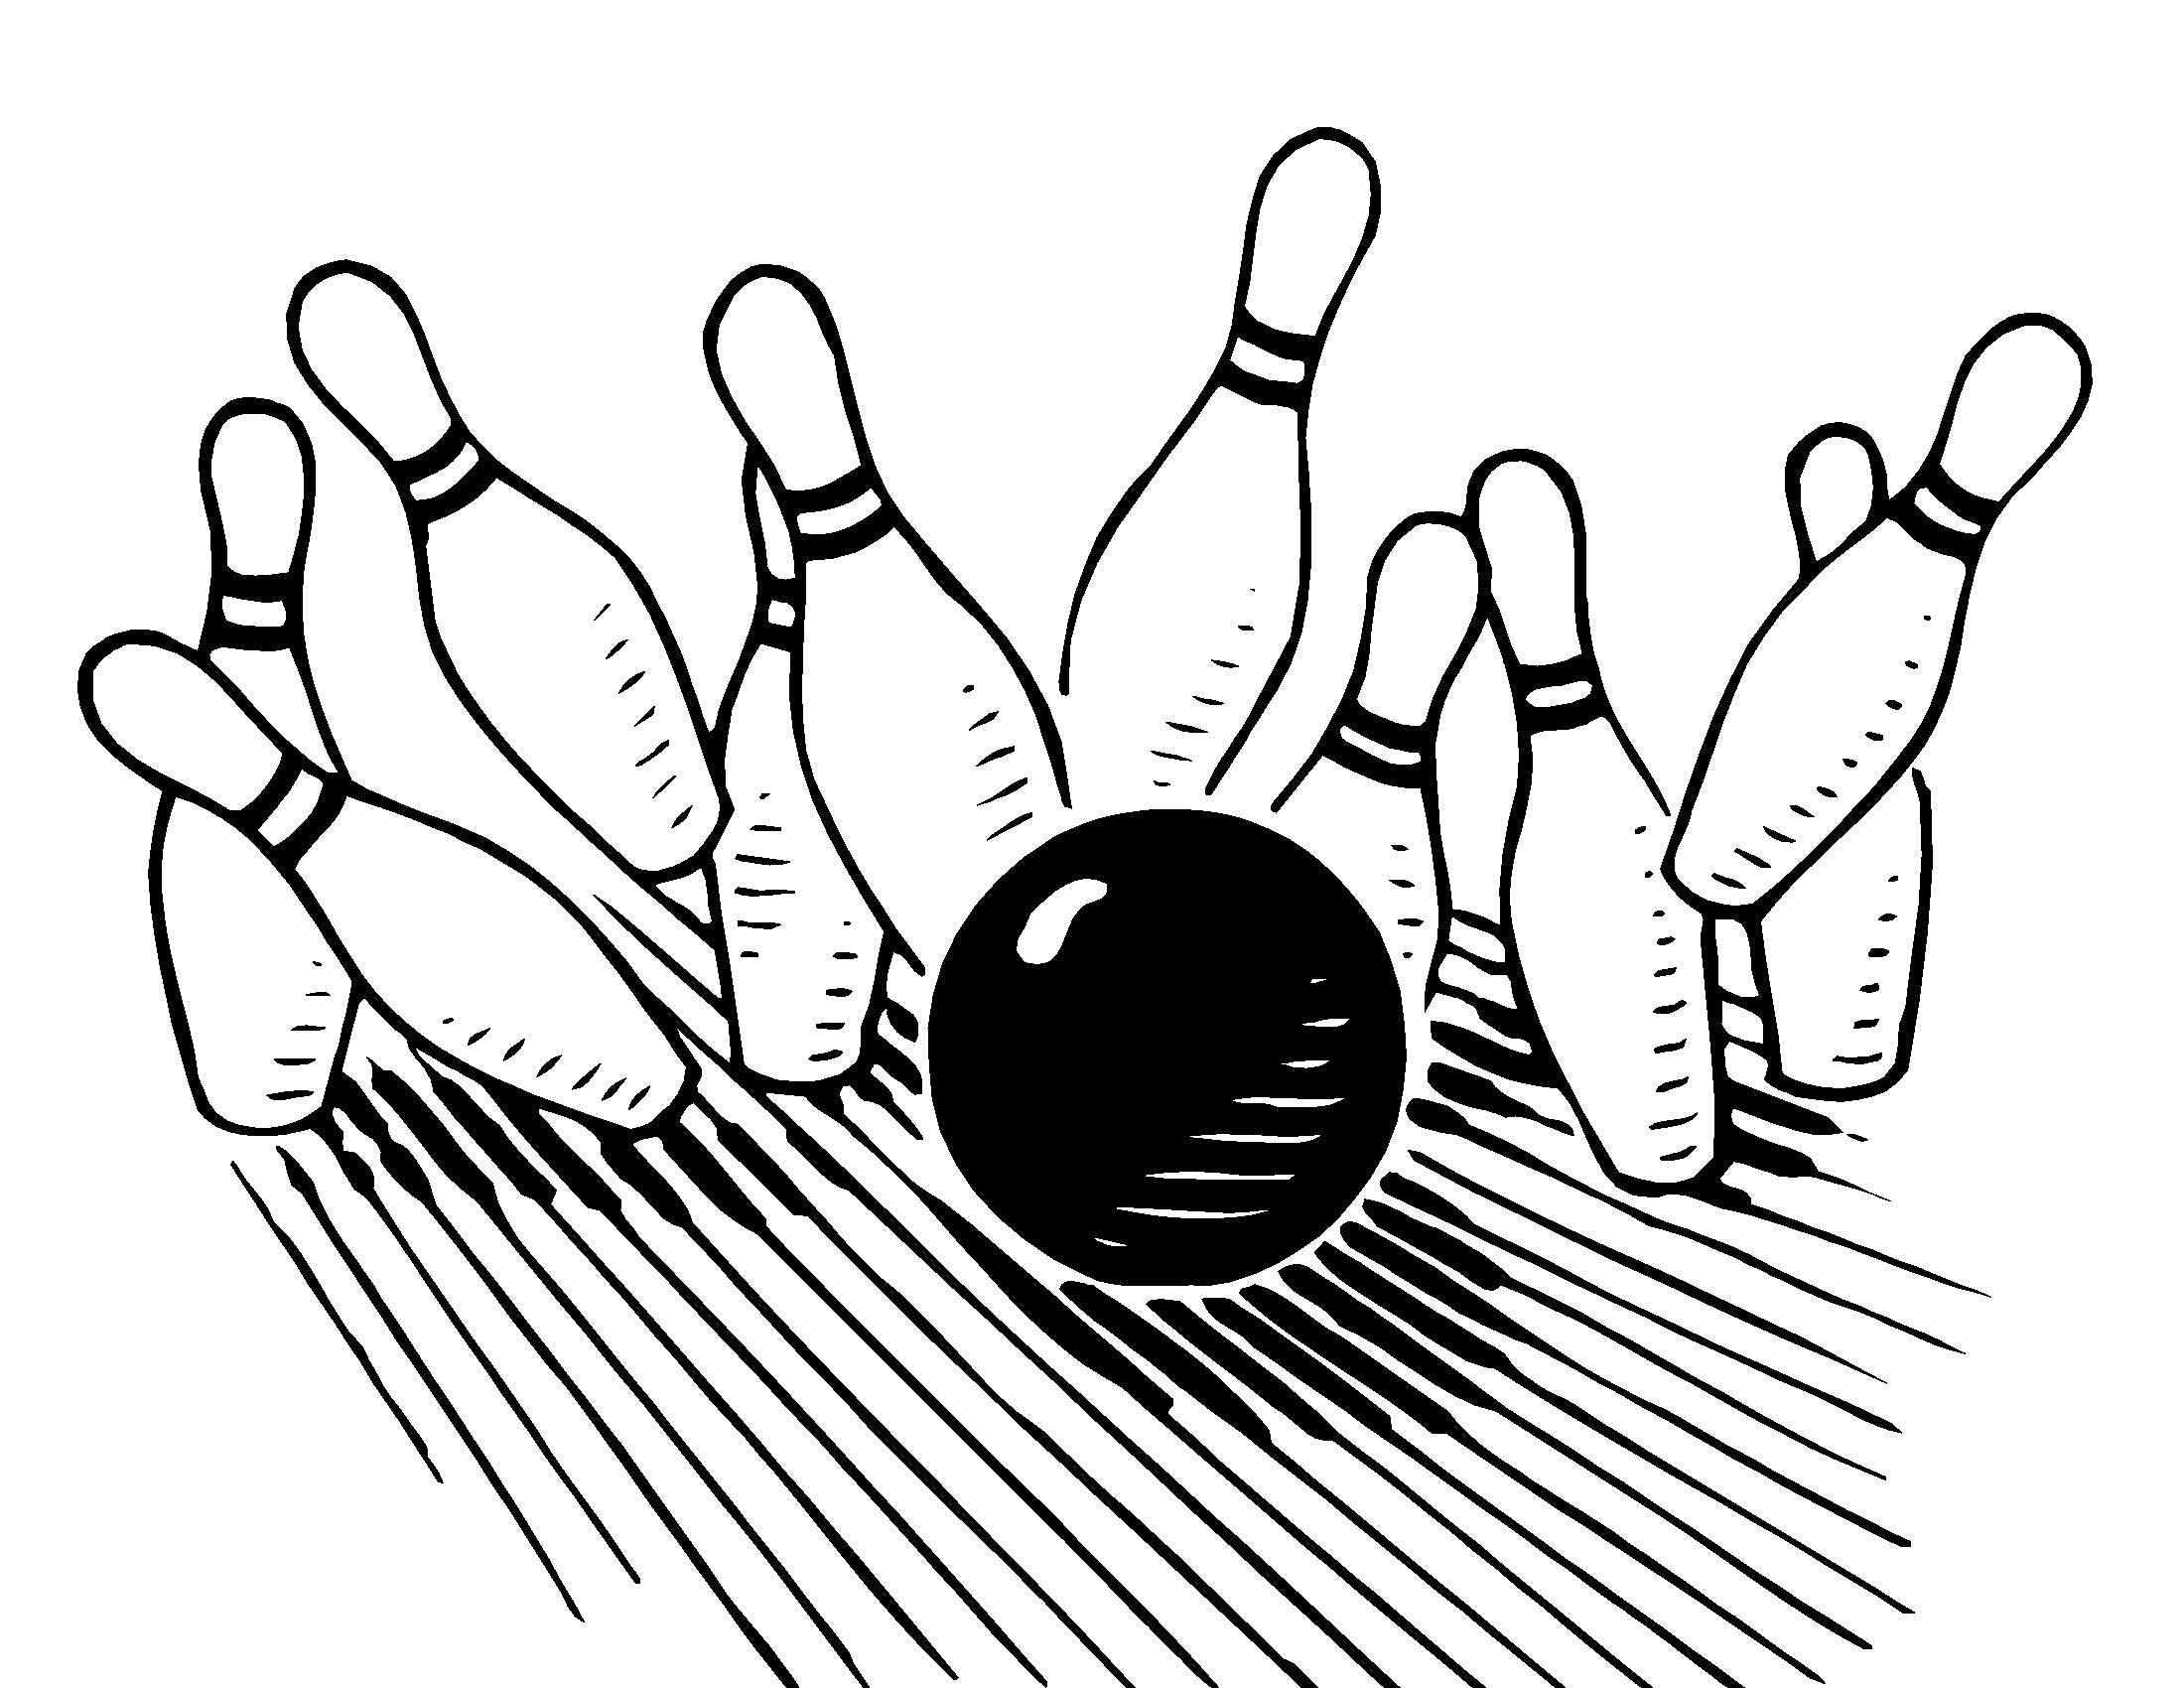 Printable Image Of A Bowling Bowl And Bowling Pin